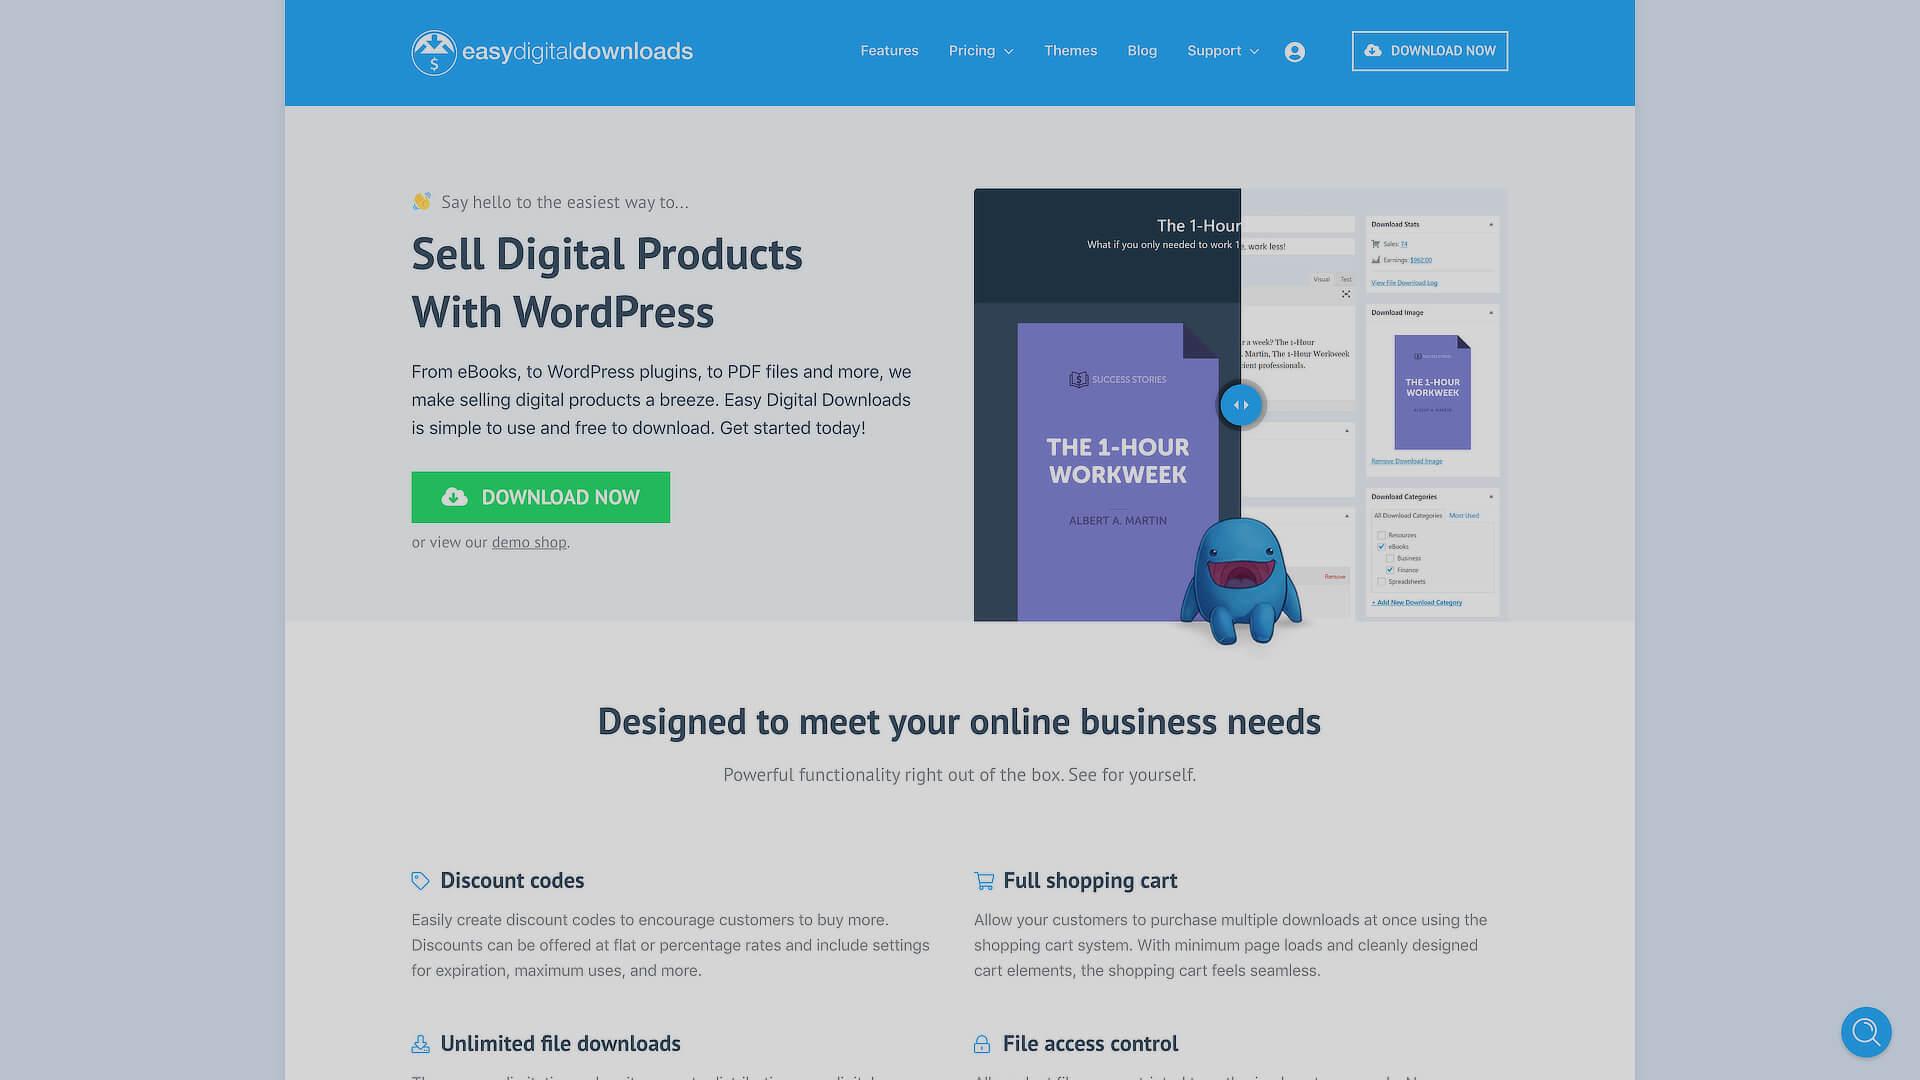 Selling Digital Products On WordPress: 2 - Easy Digital Downloads